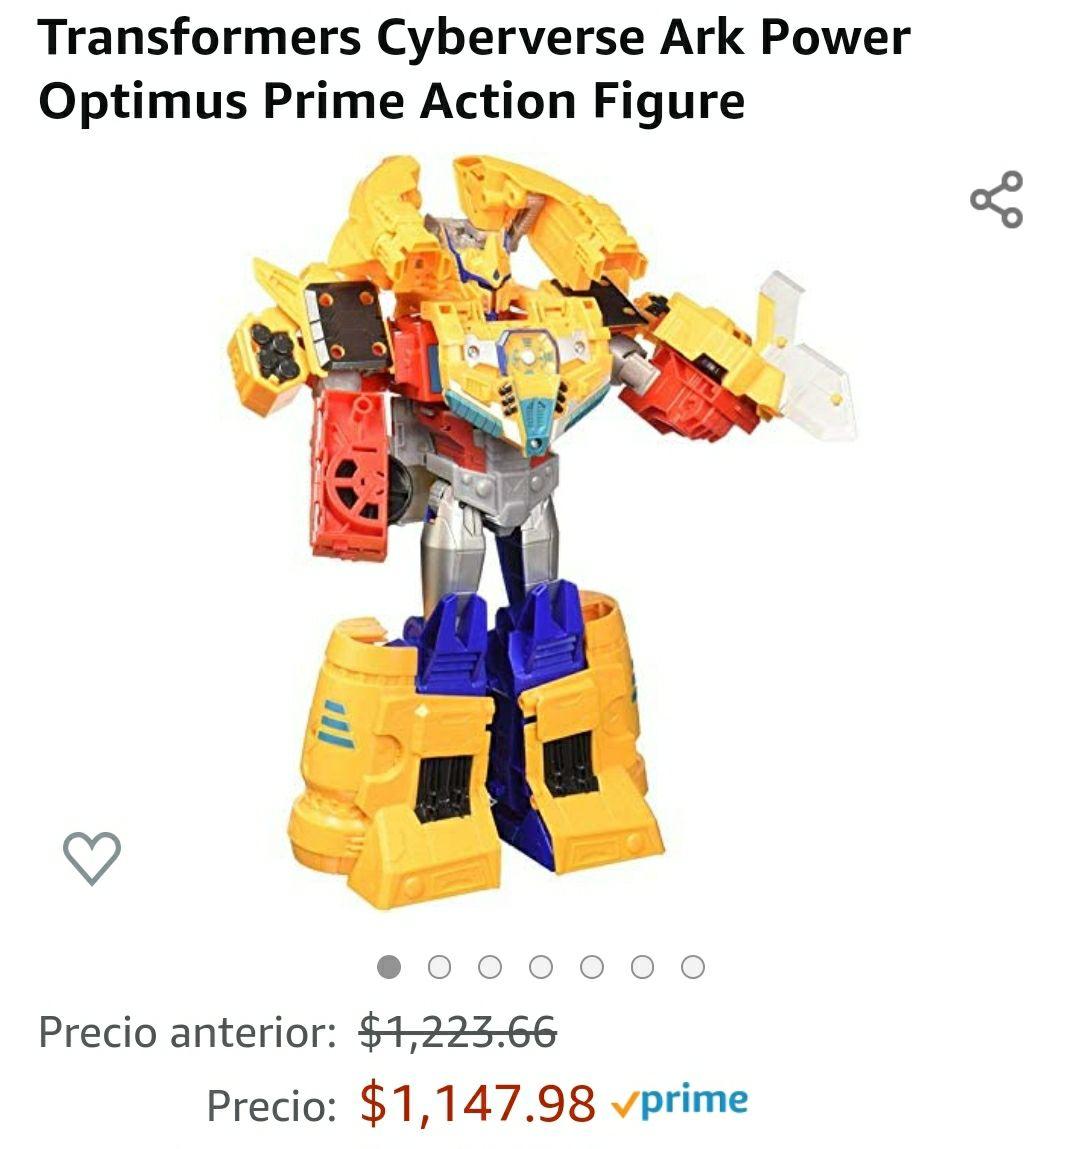 Walmart: optimus prime cyberverse ark power